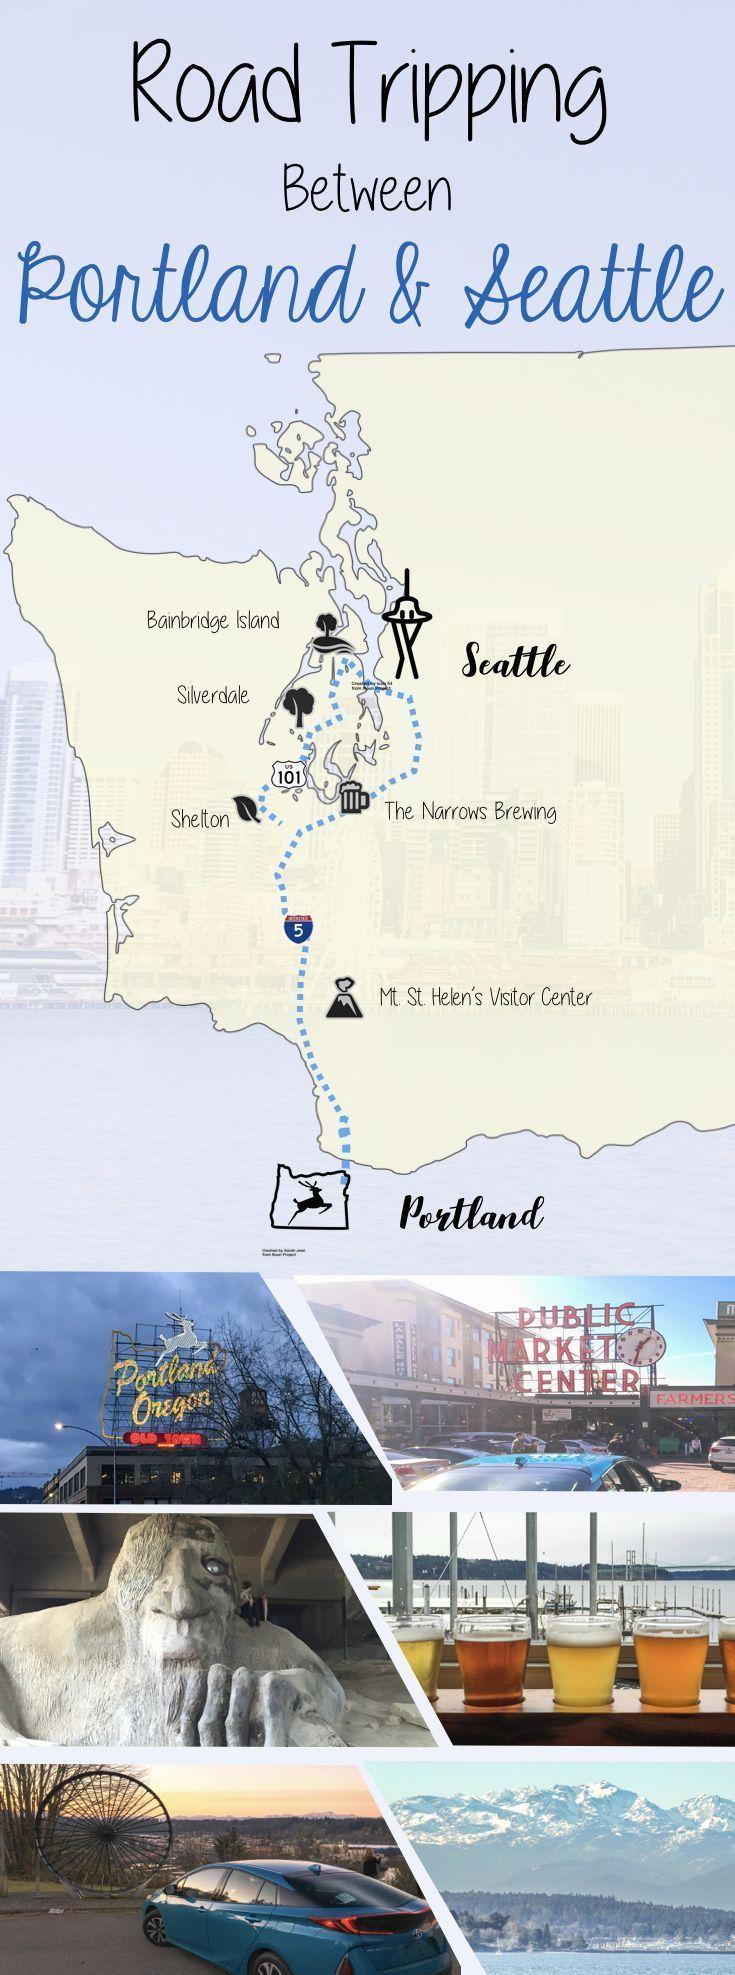 Road Trip between Portland and Seattle. Washington Road trip itinerary. #TravelDestinationsUsaWashington